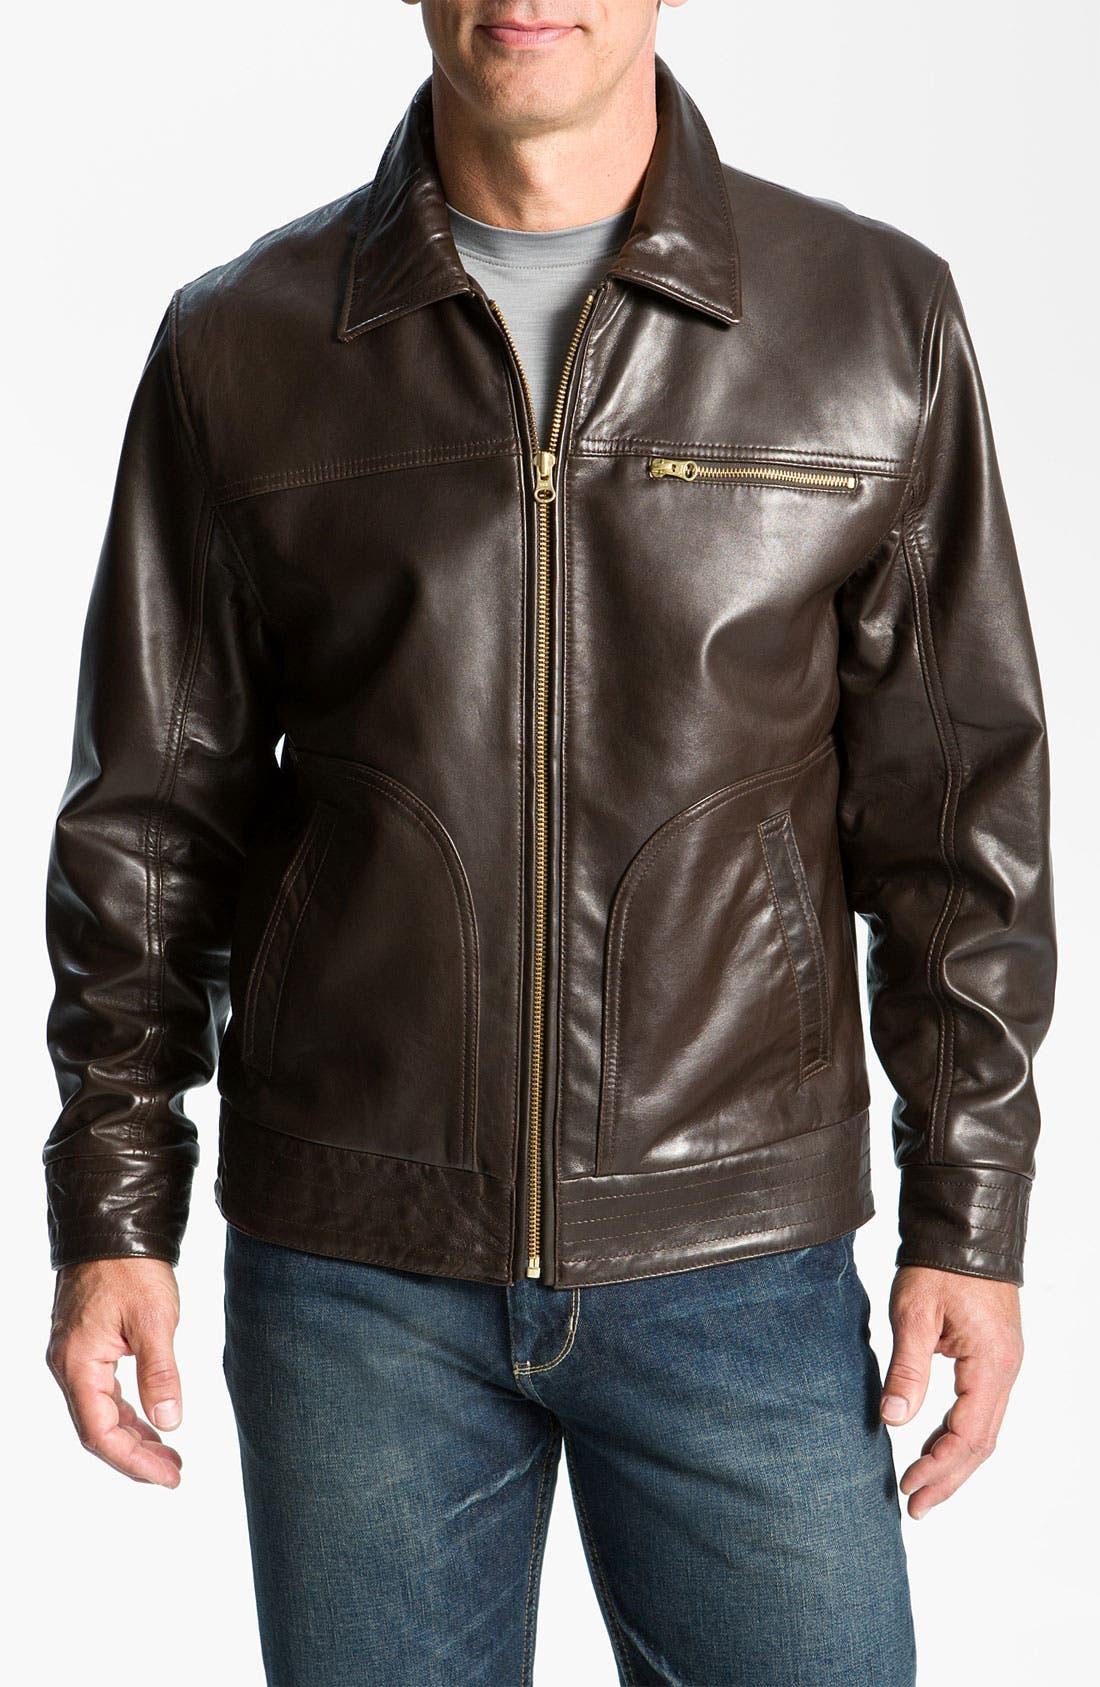 Main Image - Cutter & Buck 'Wildridge' Leather Bomber Jacket (Big & Tall)